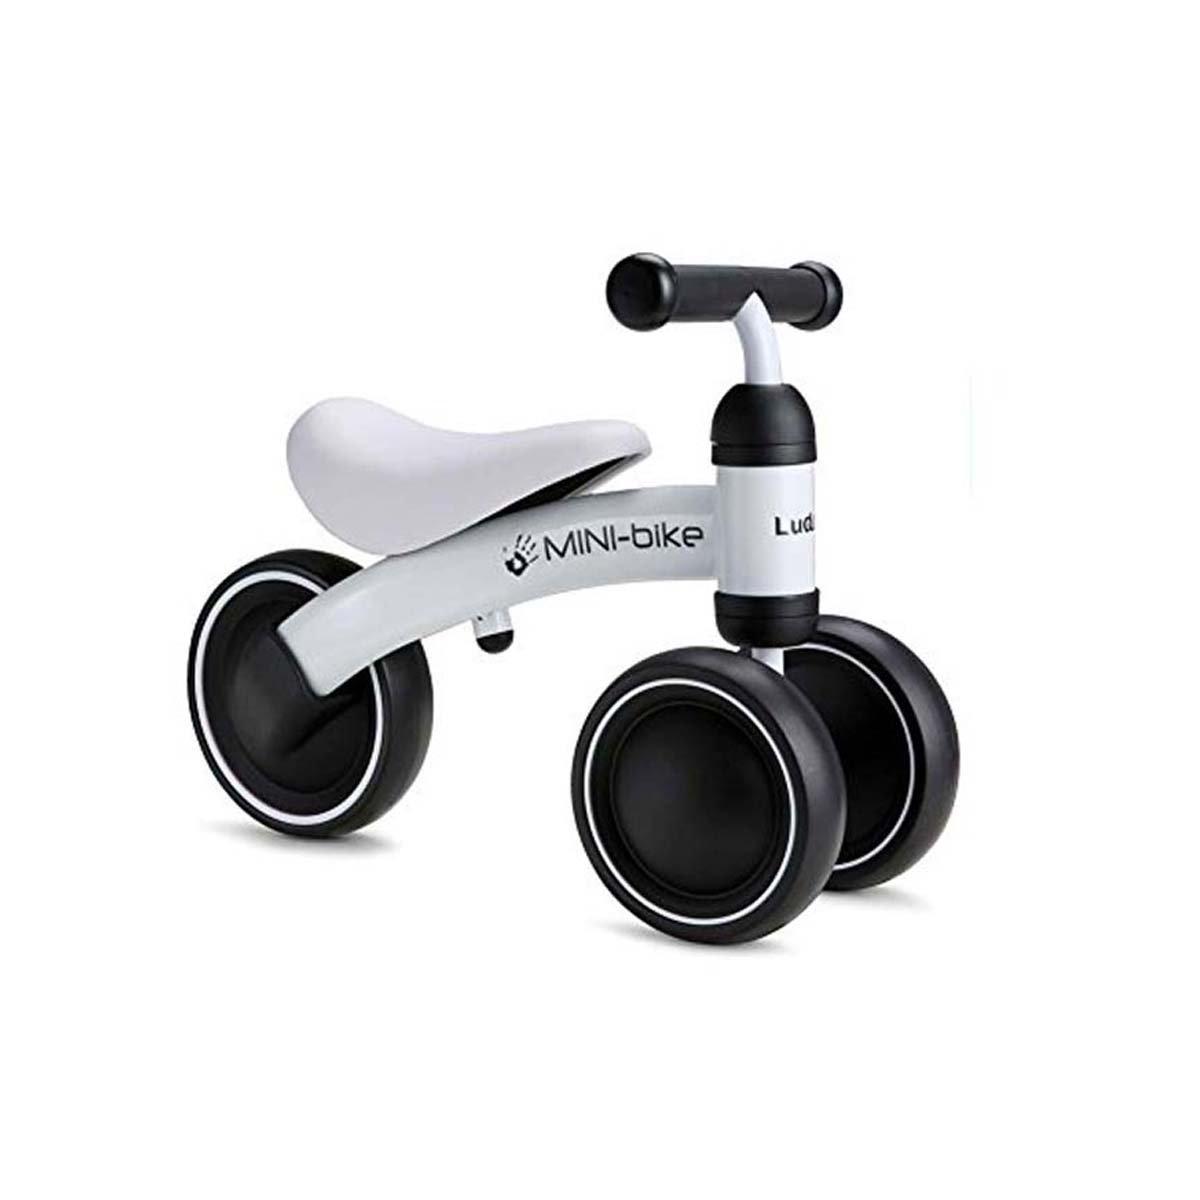 Baby Shining Balance Bike,Baby Ride Toy Learn to Walk,12-24 Month No-Pedal Balance Bike to Kids